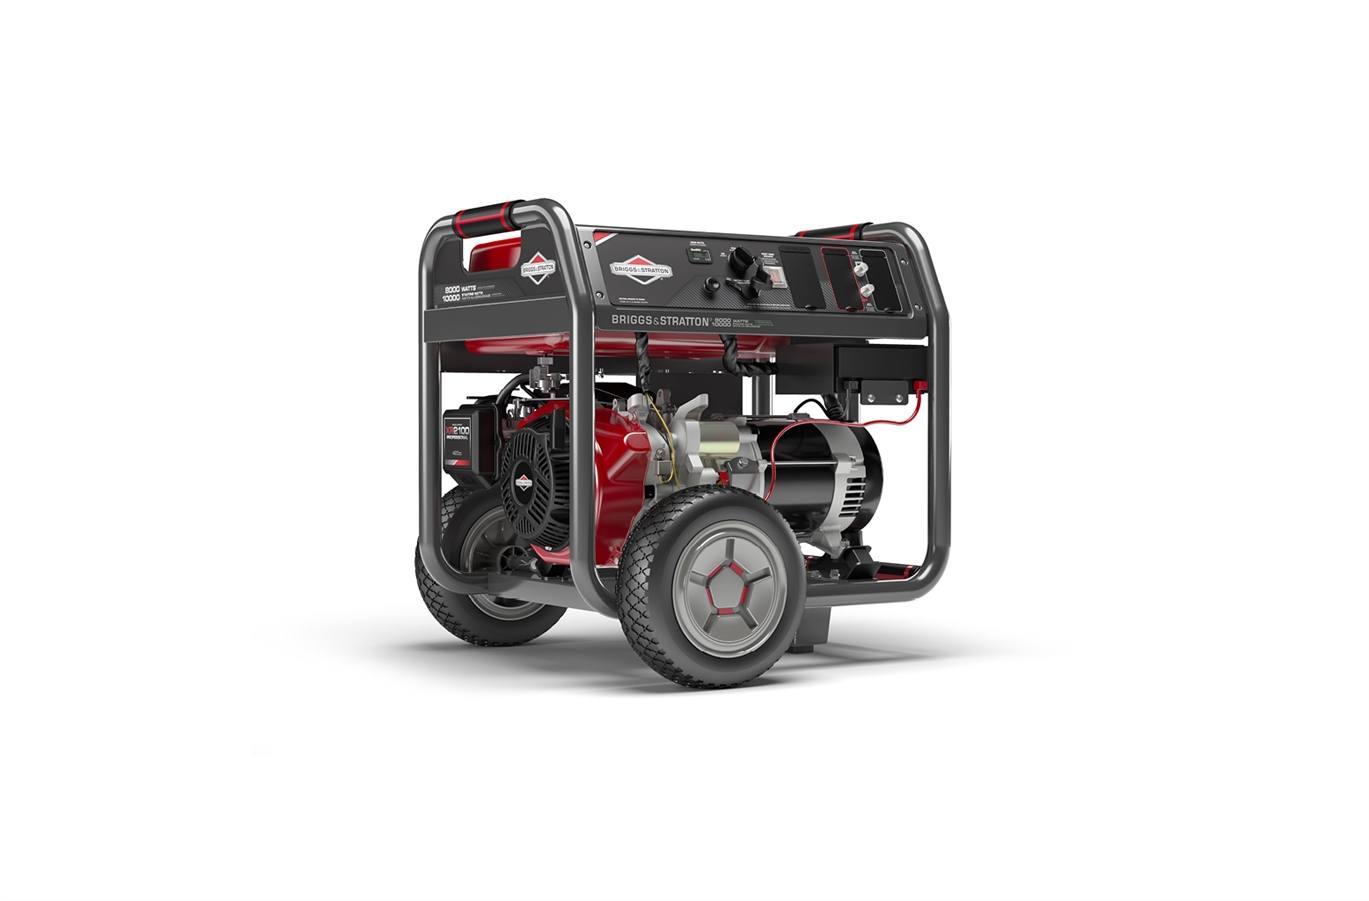 2019 Briggs & Stratton 8000 Watt Elite Series™ Portable Generator